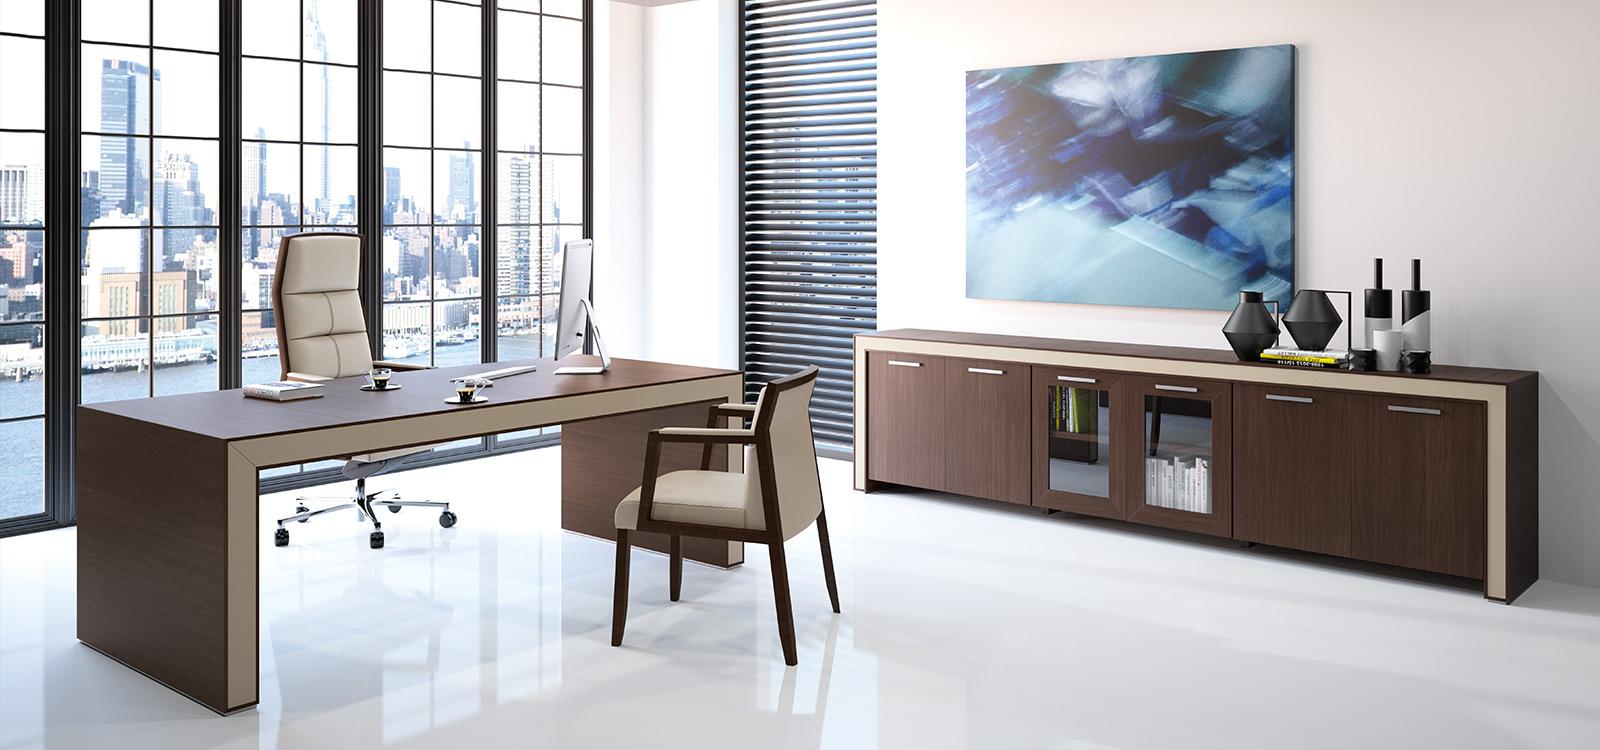 OFIFRAN-belesa-slide-12 Mobiliario  - Mobiliario de Oficina